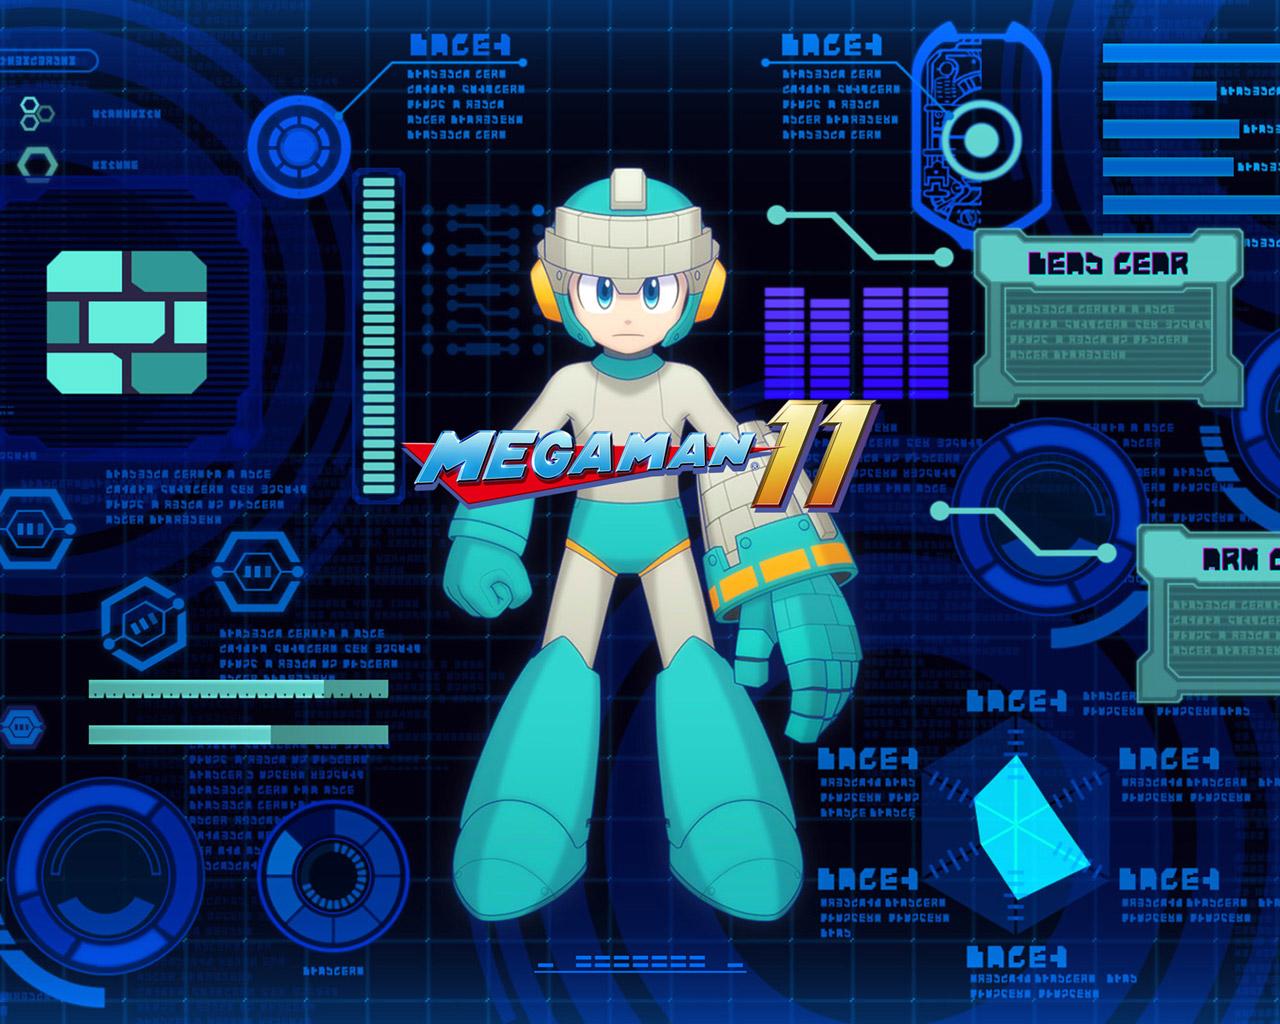 Mega Man 11 Wallpaper in 1280x1024